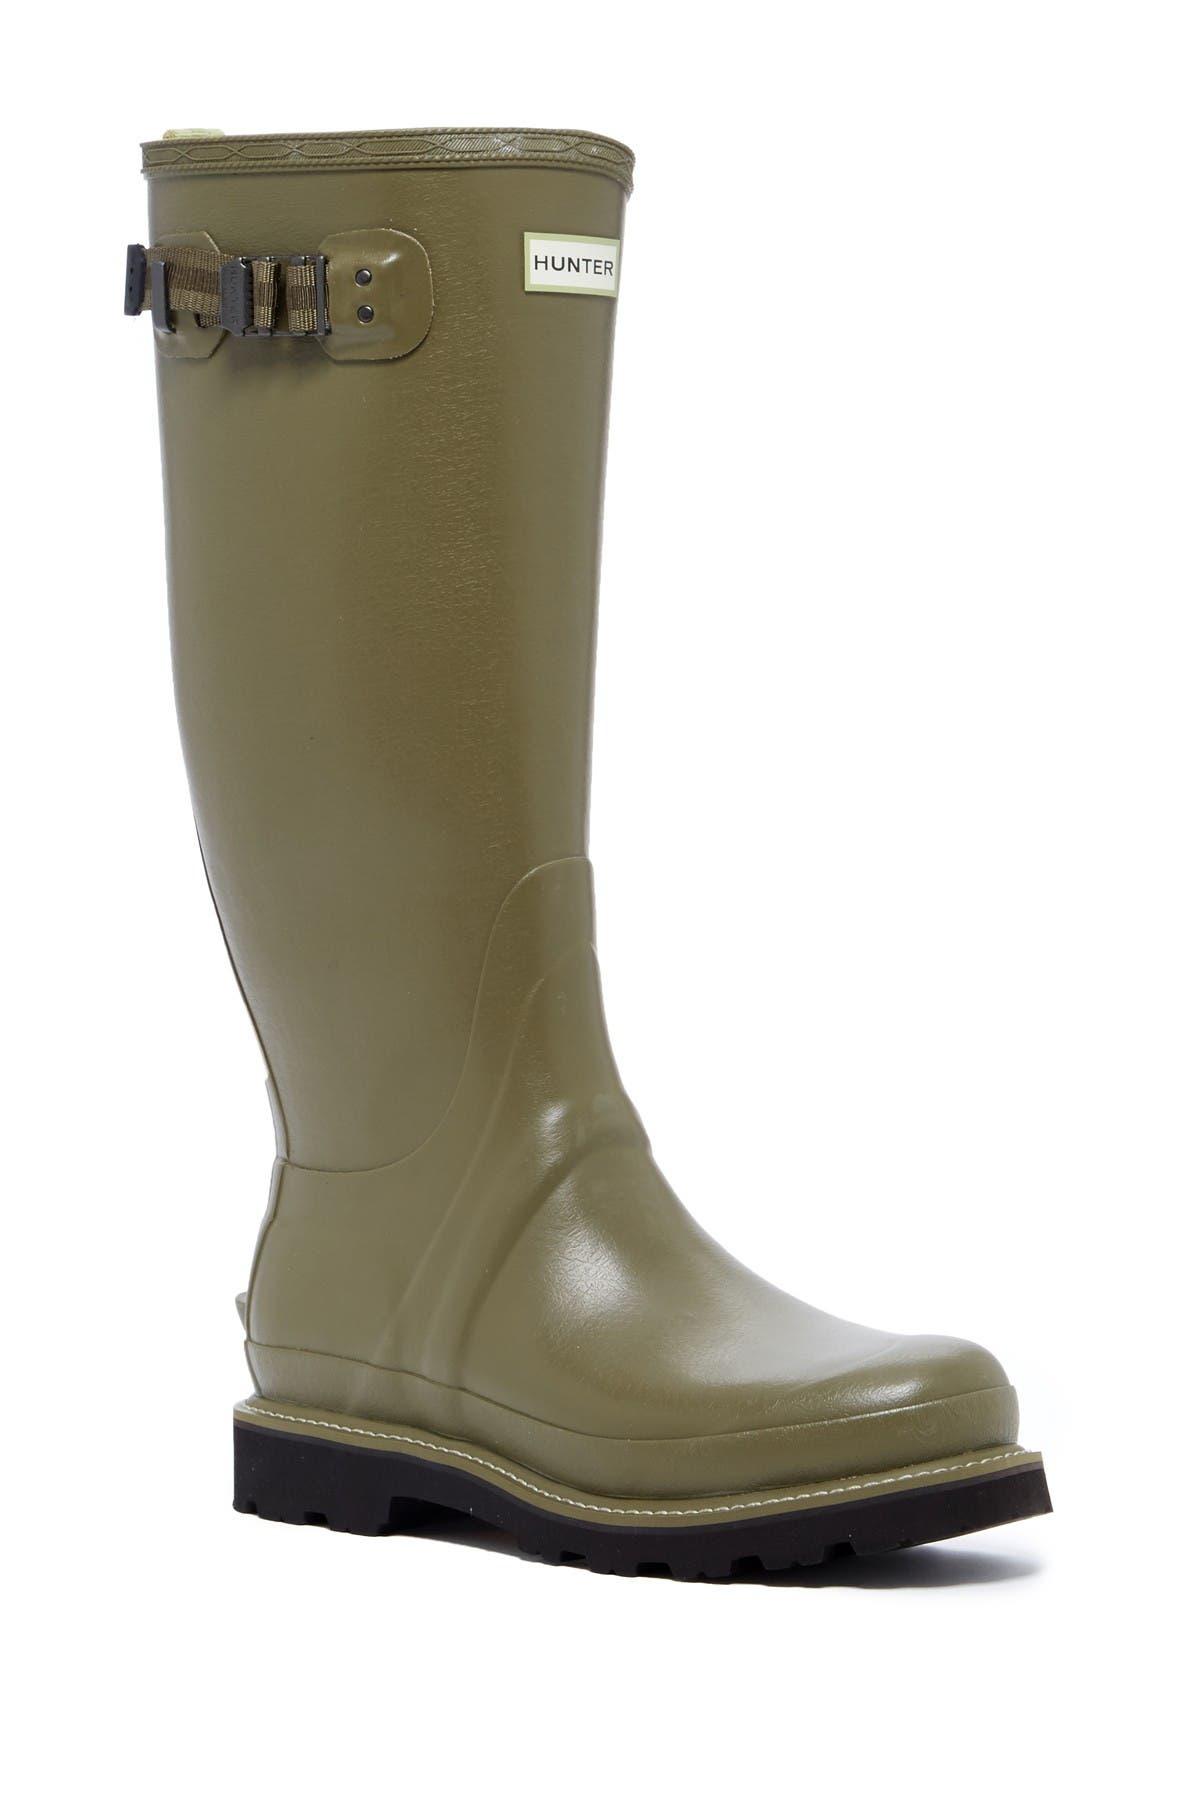 Image of Hunter Balmoral Sovereign Waterproof Boots